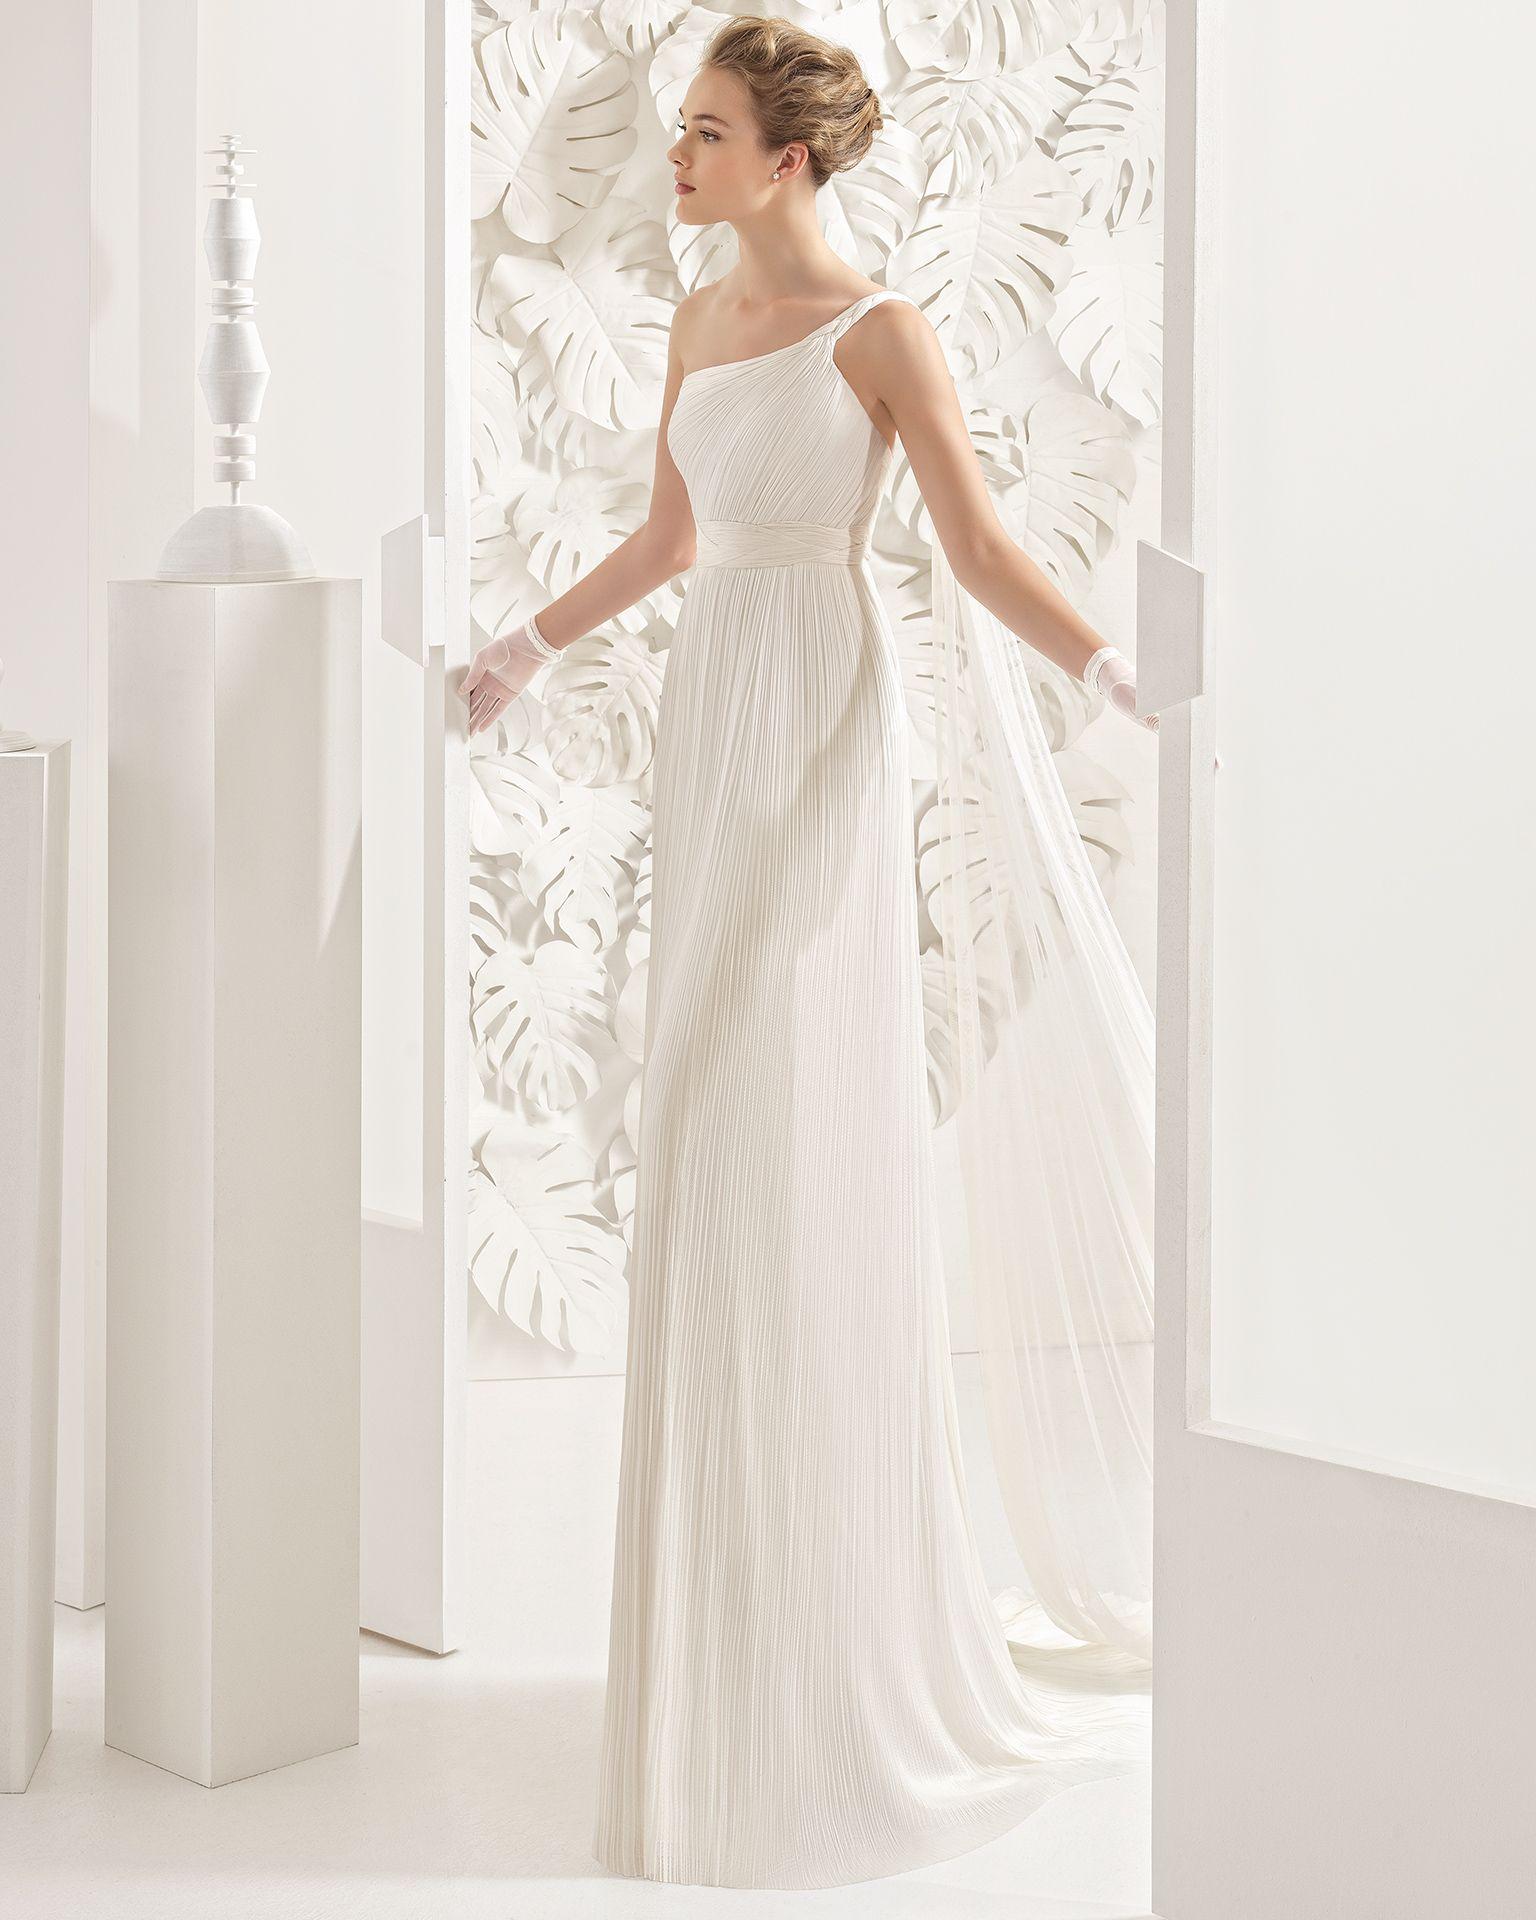 Nacir 2017 Bridal Collection Rosa Clara In 2020 Greek